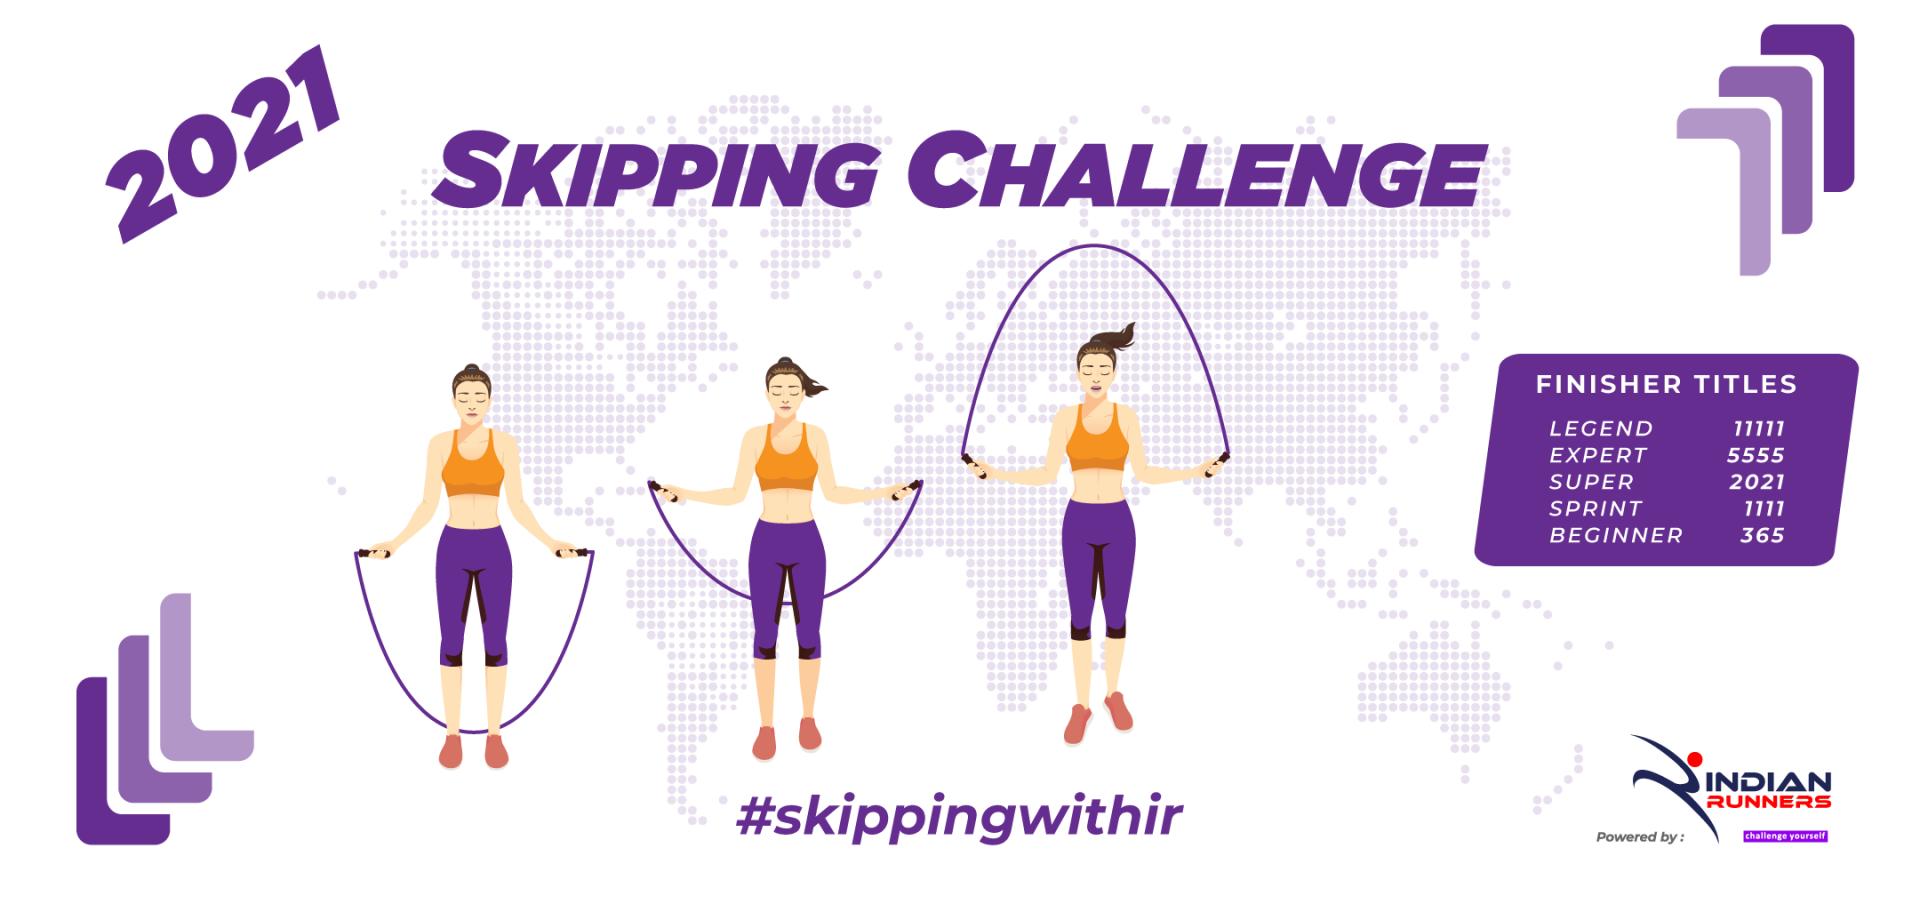 Skipping Challenge 2021 image